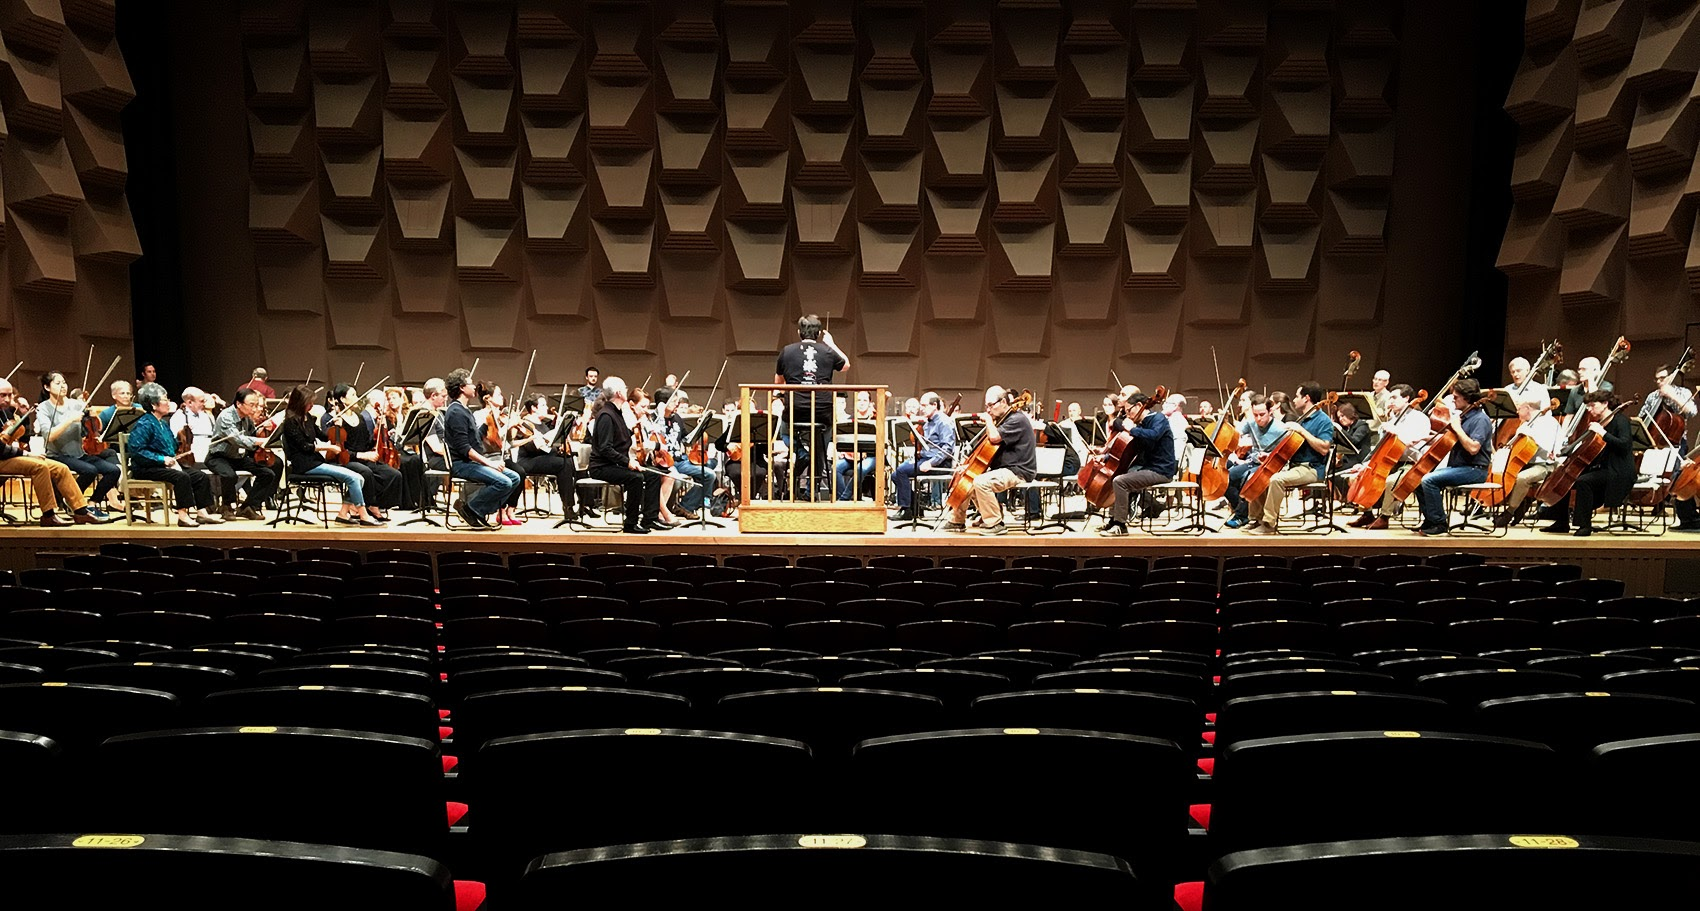 The BSO during rehearsal at Osaka Festival Hall in Japan. (Andrea Shea/WBUR)